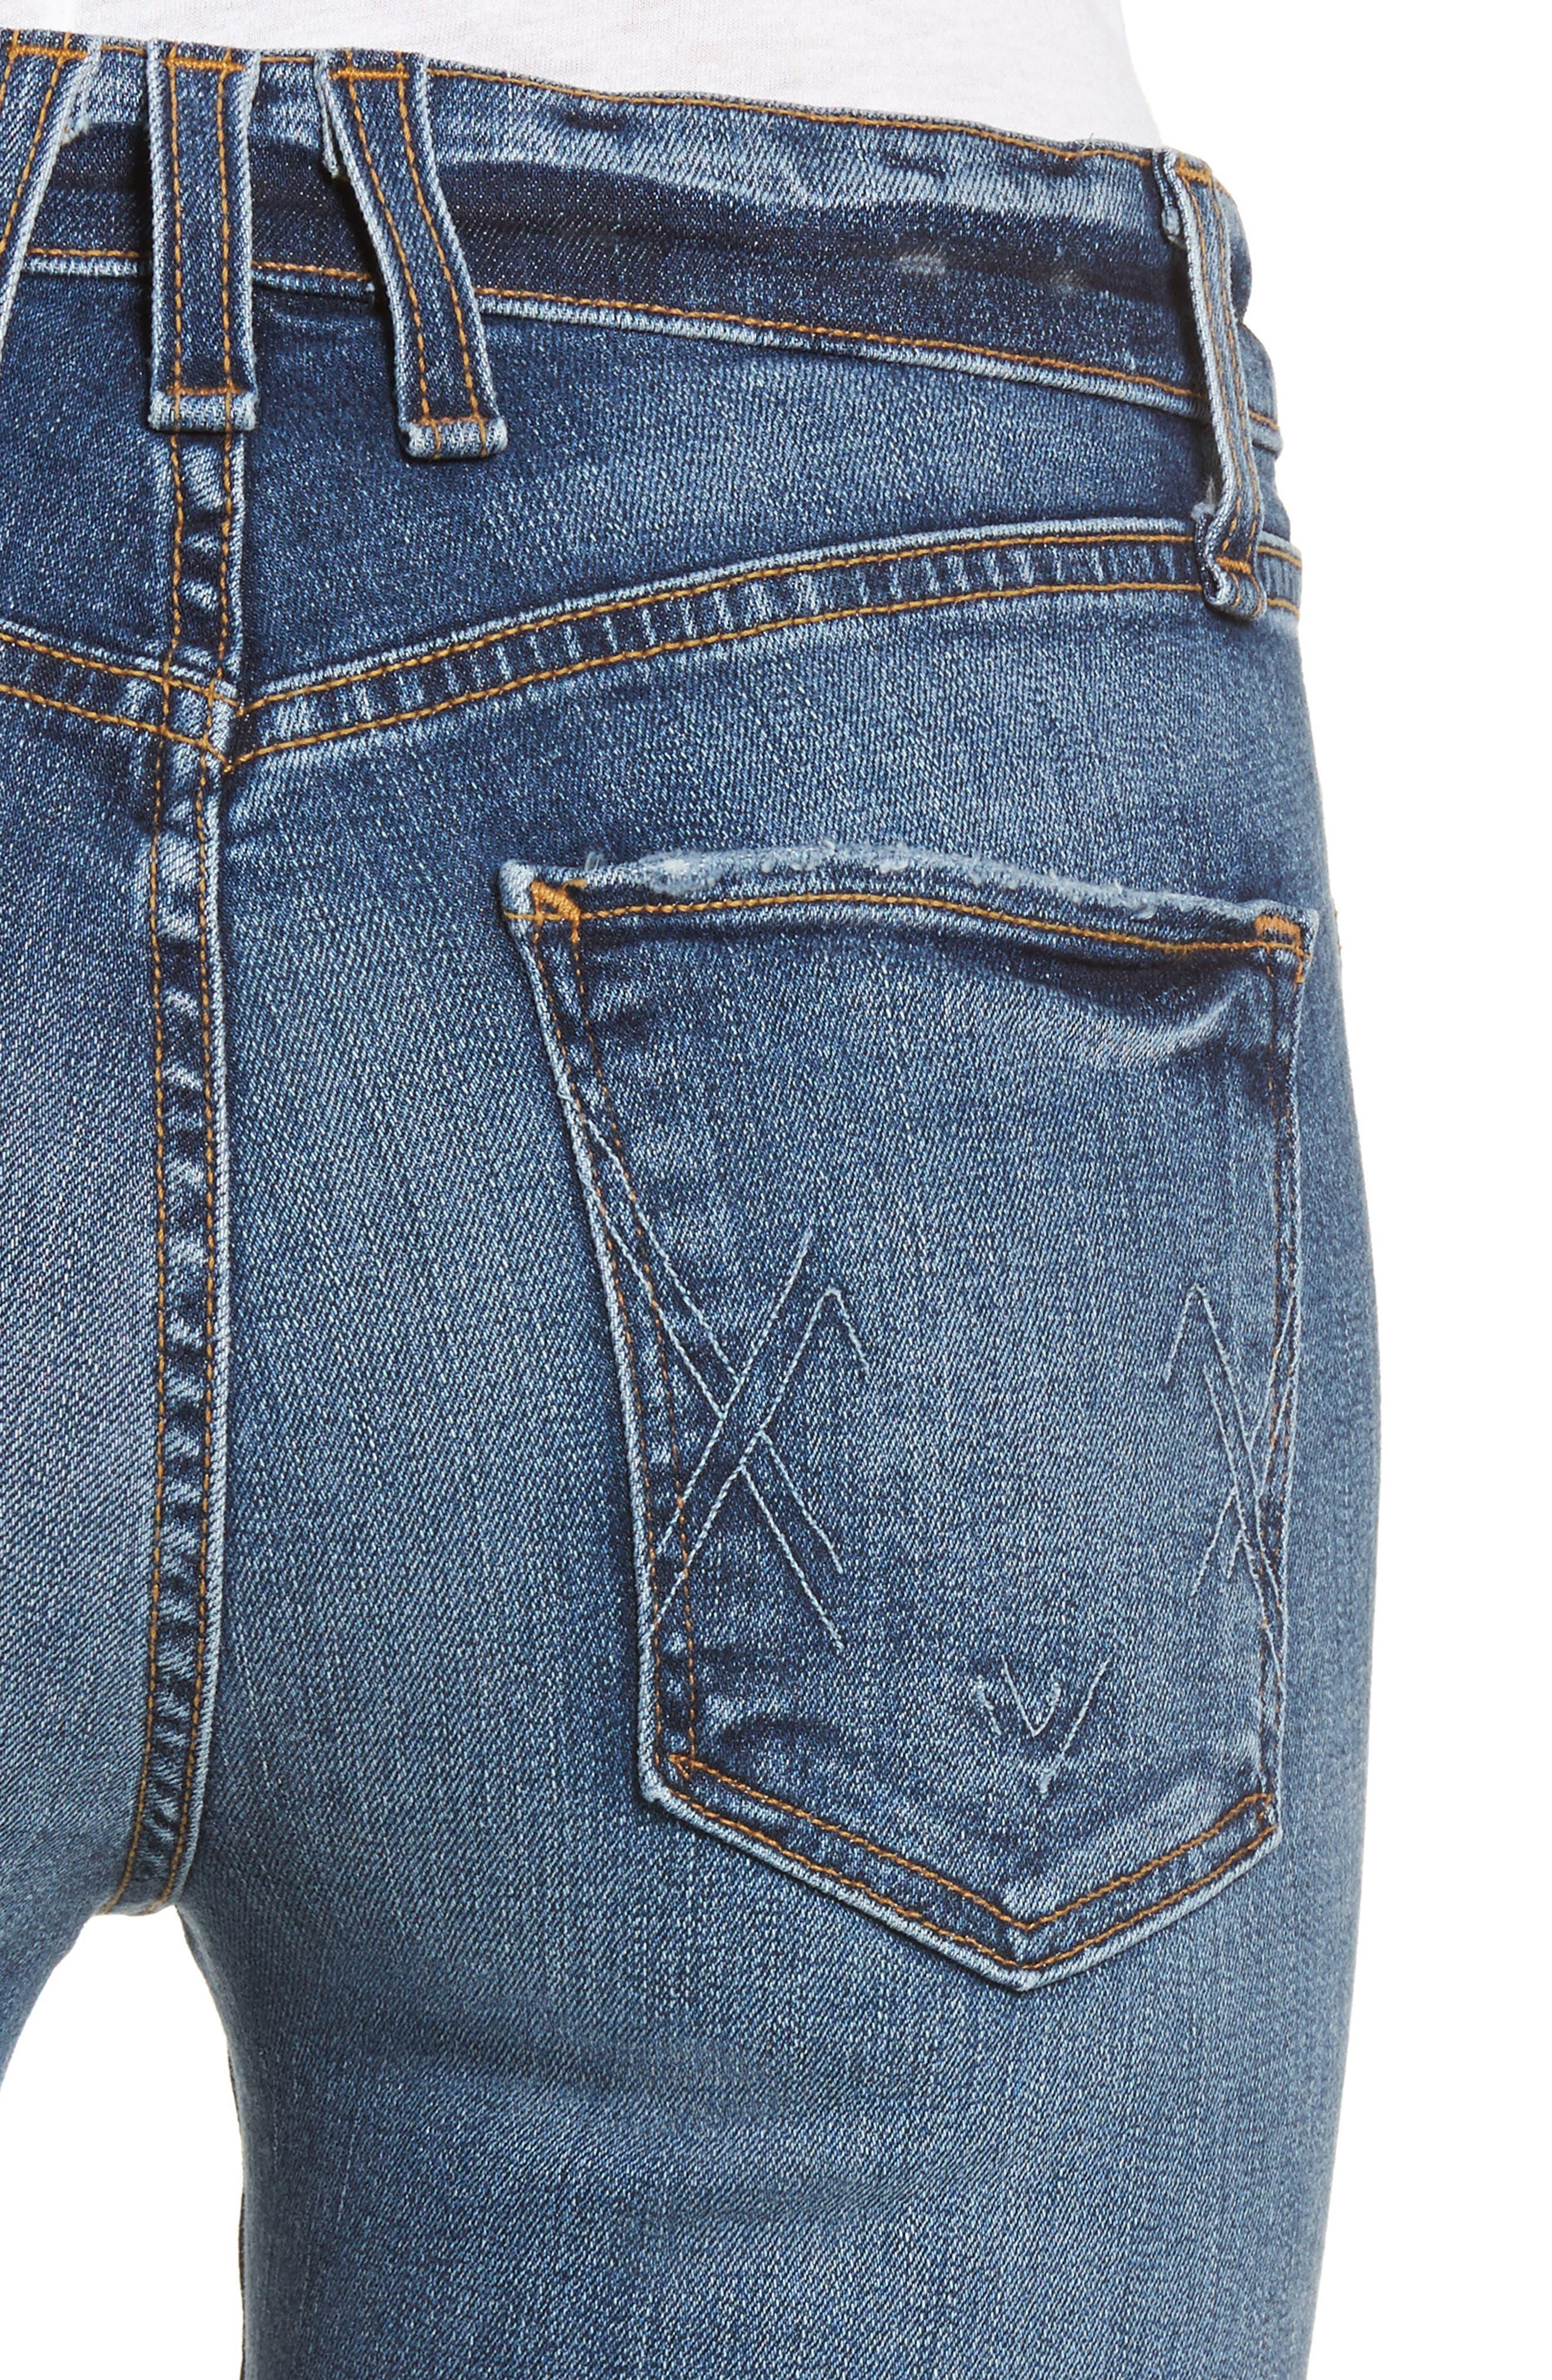 Windsor Destroyed High Waist Straight Leg Jeans,                             Alternate thumbnail 4, color,                             430